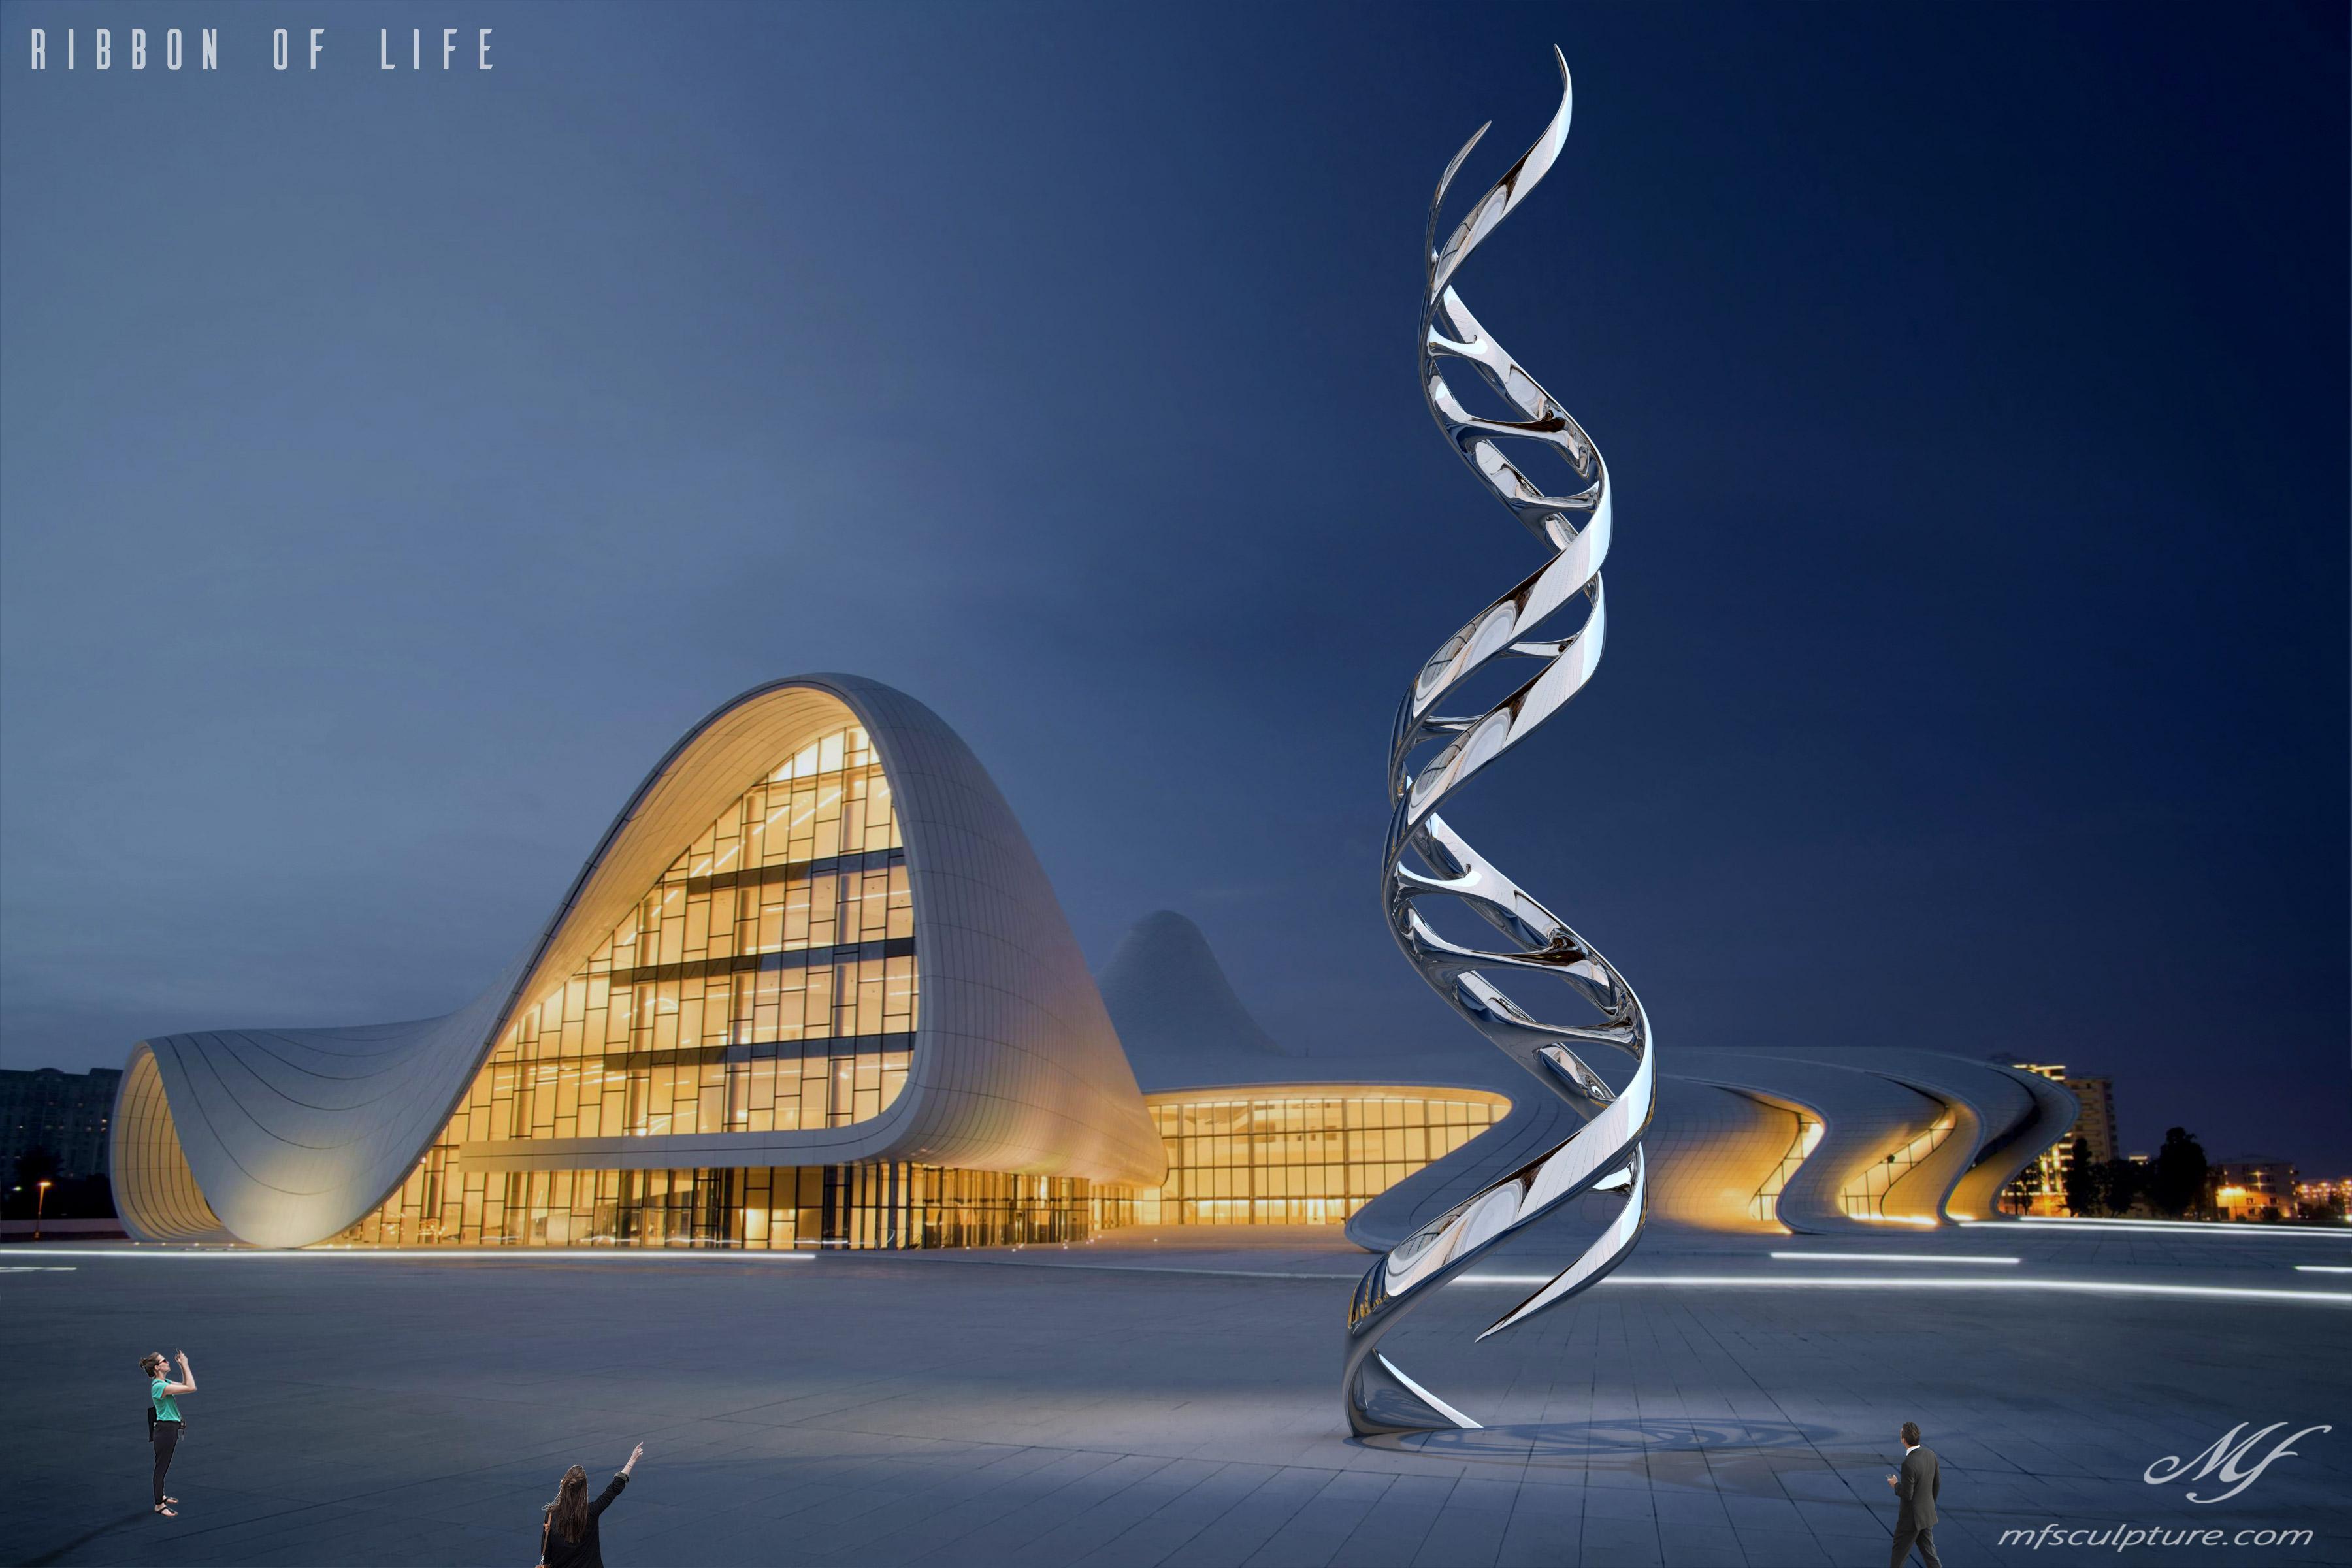 Heydar Aliyev Zaha Hadid Convergence Modern Sculpture Public Art DNA Ribbon of Life Science 2